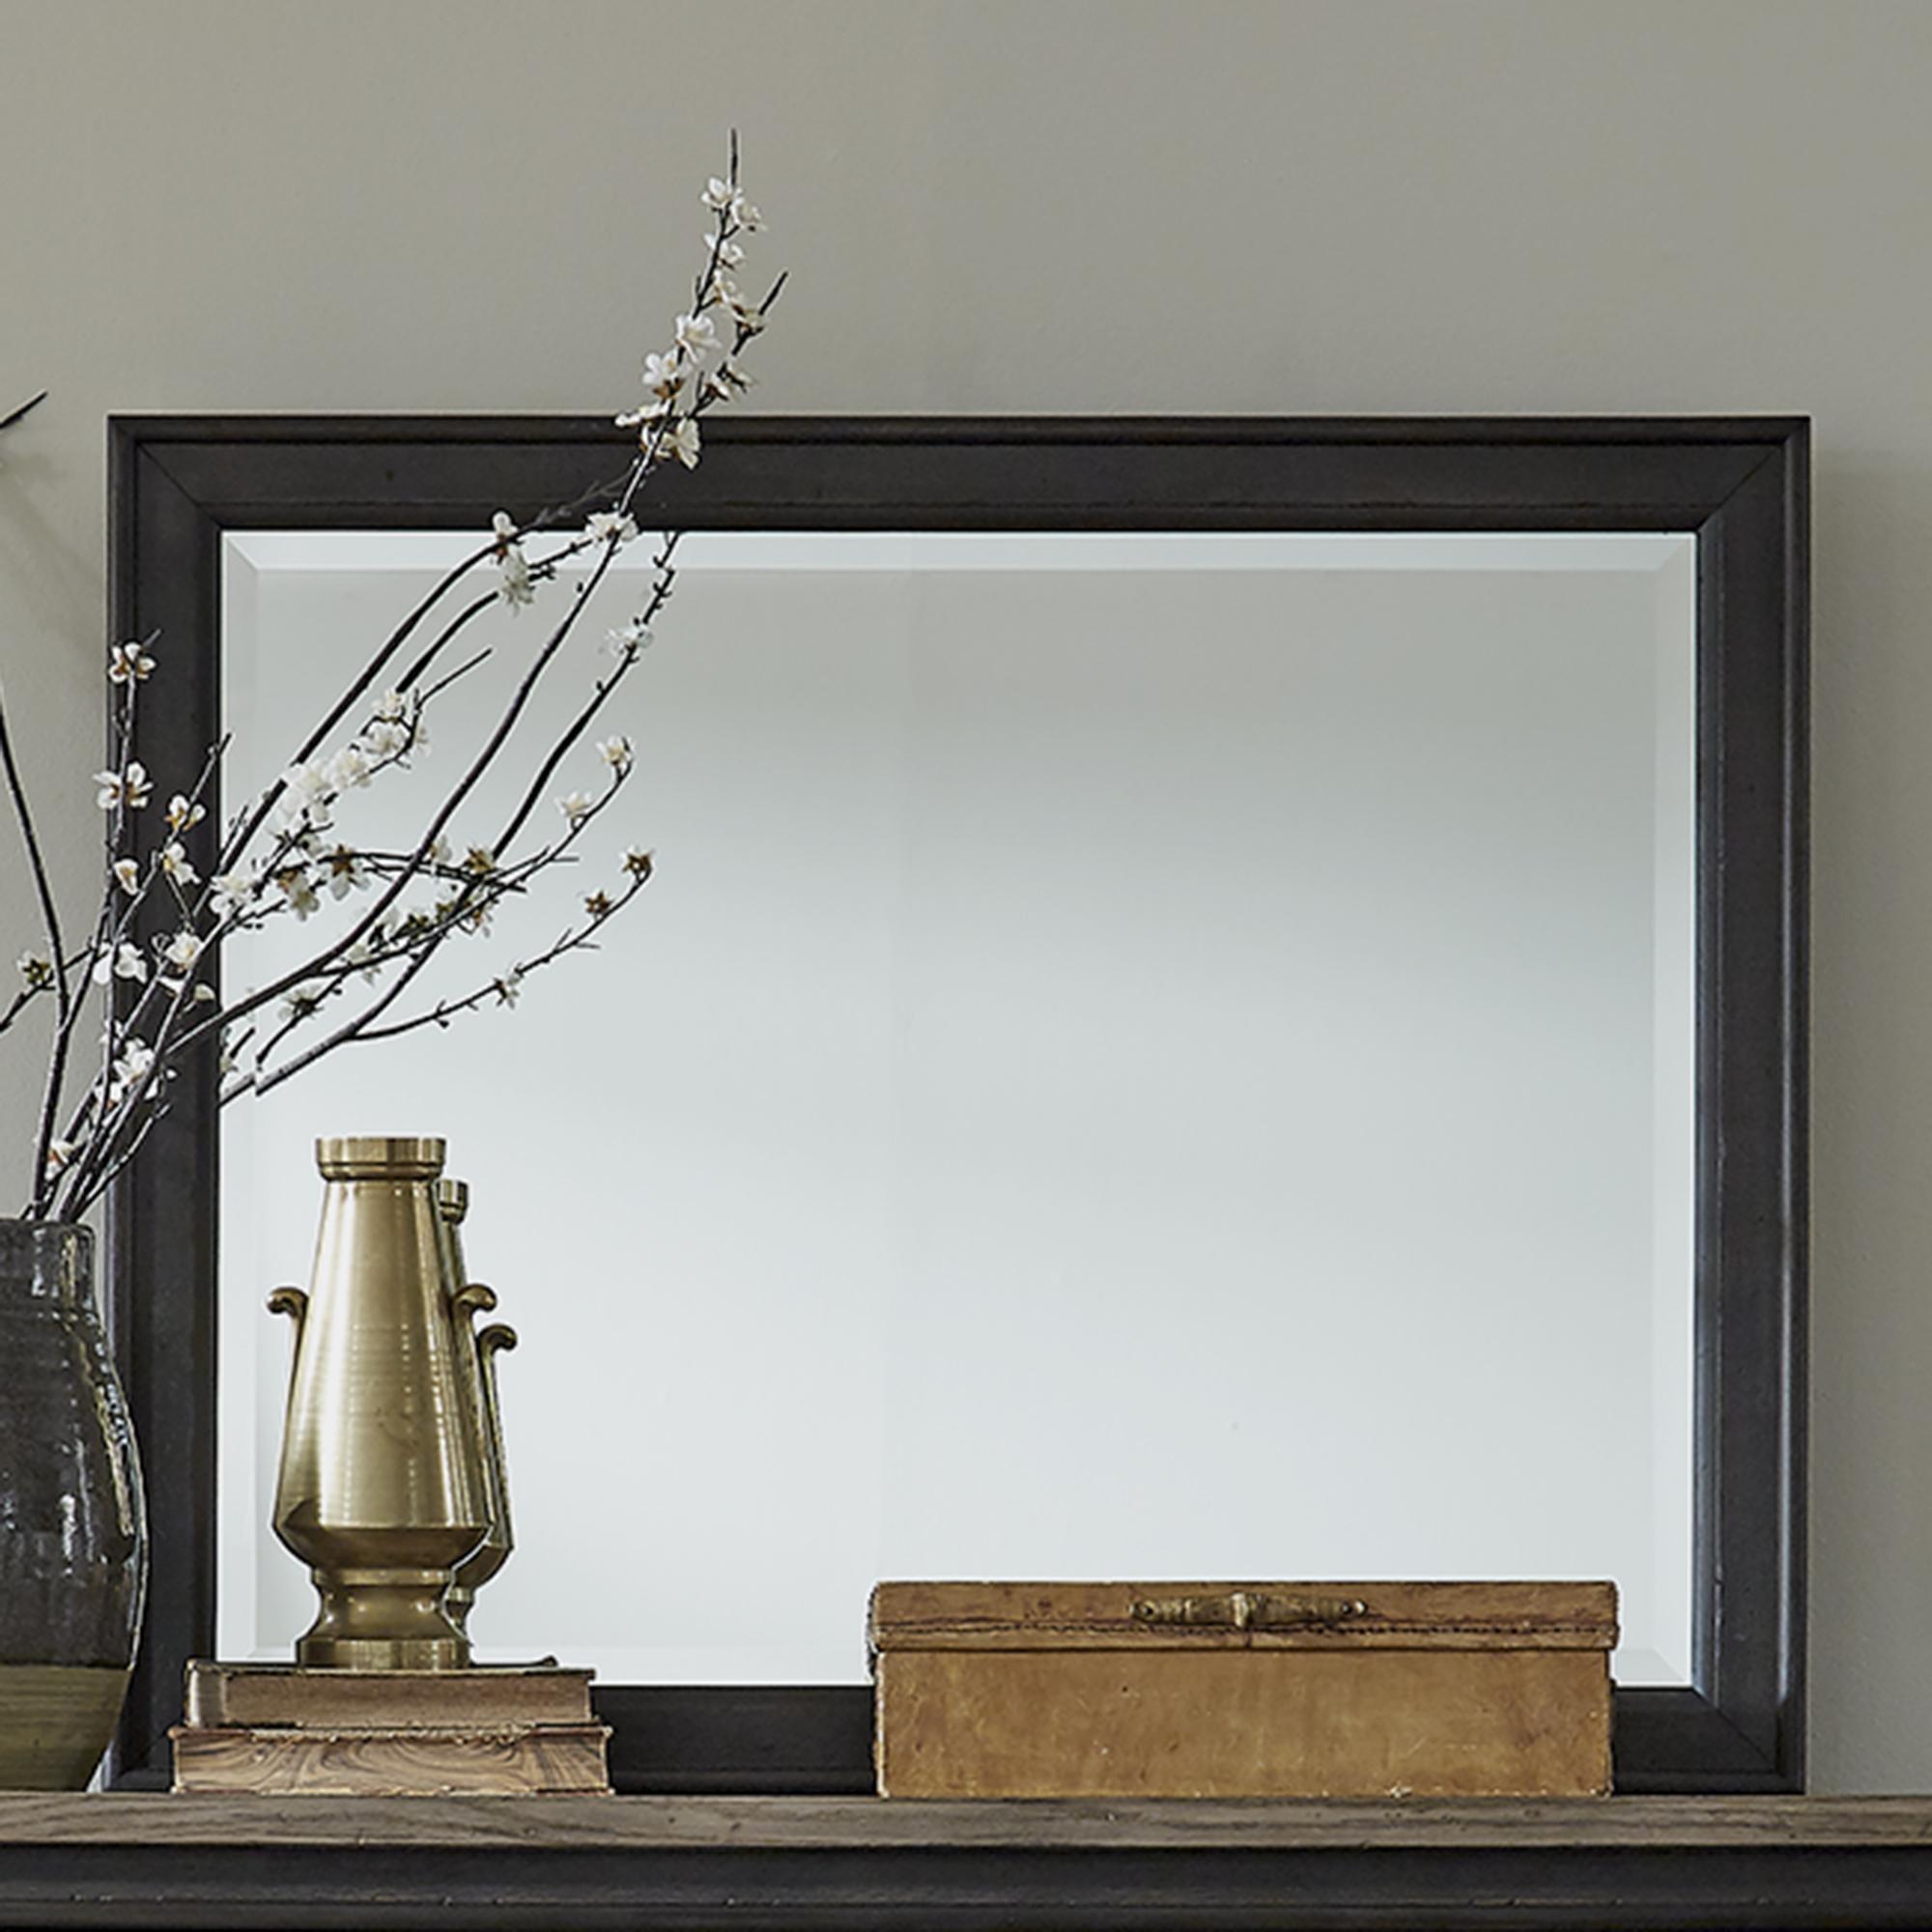 Americana Farmhouse Landscape Dresser Mirror by Liberty Furniture at Esprit Decor Home Furnishings